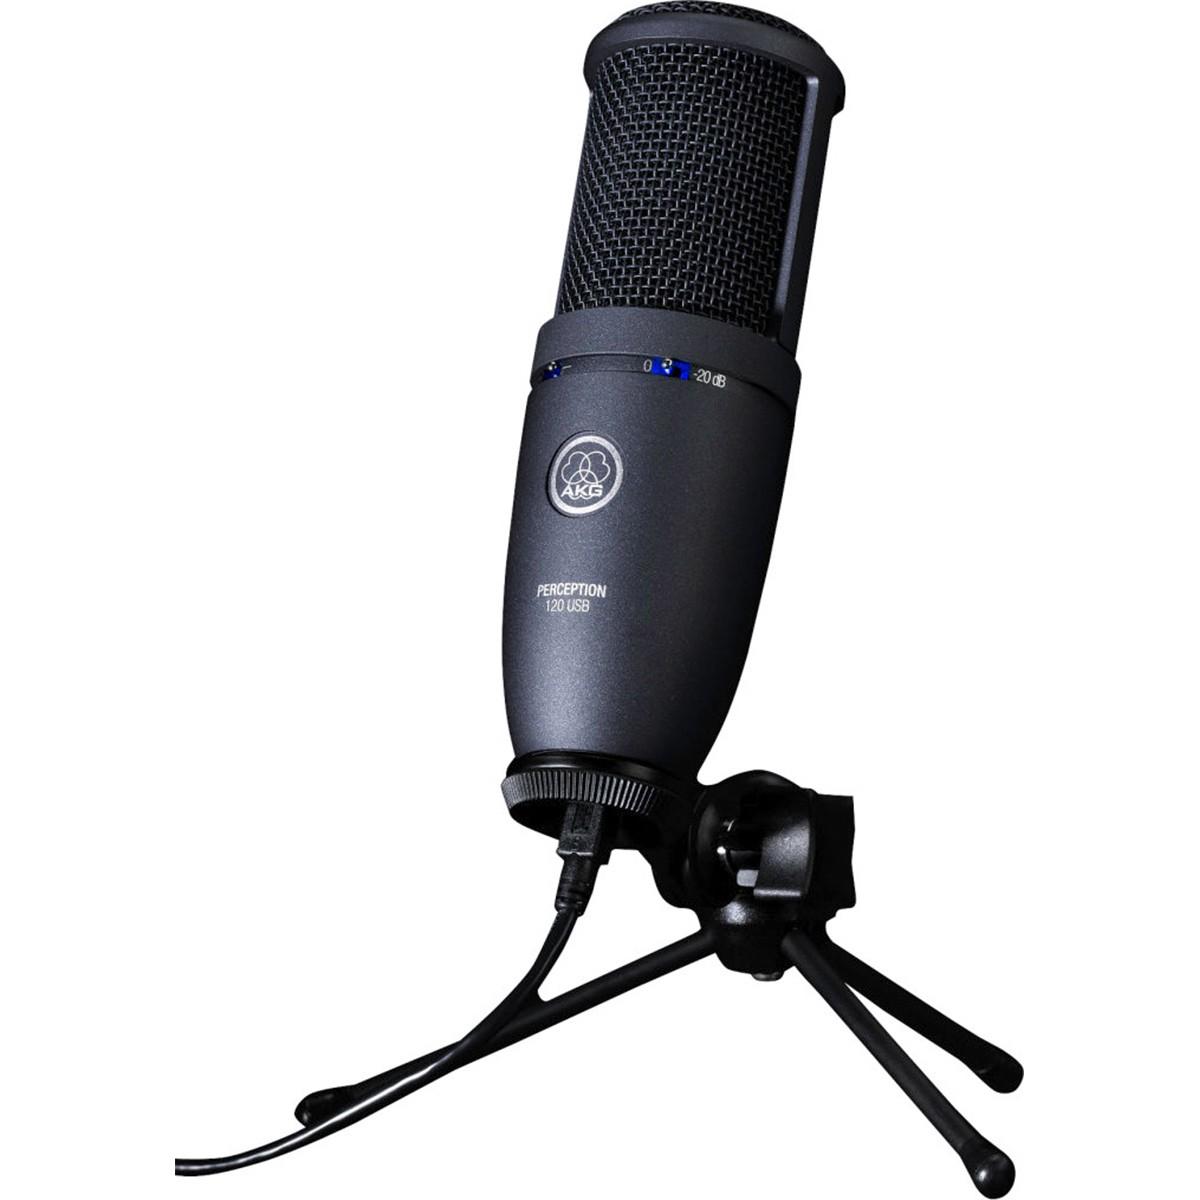 akg perception 120 usb condenser microphone music machine musical instruments nz guitars nz. Black Bedroom Furniture Sets. Home Design Ideas